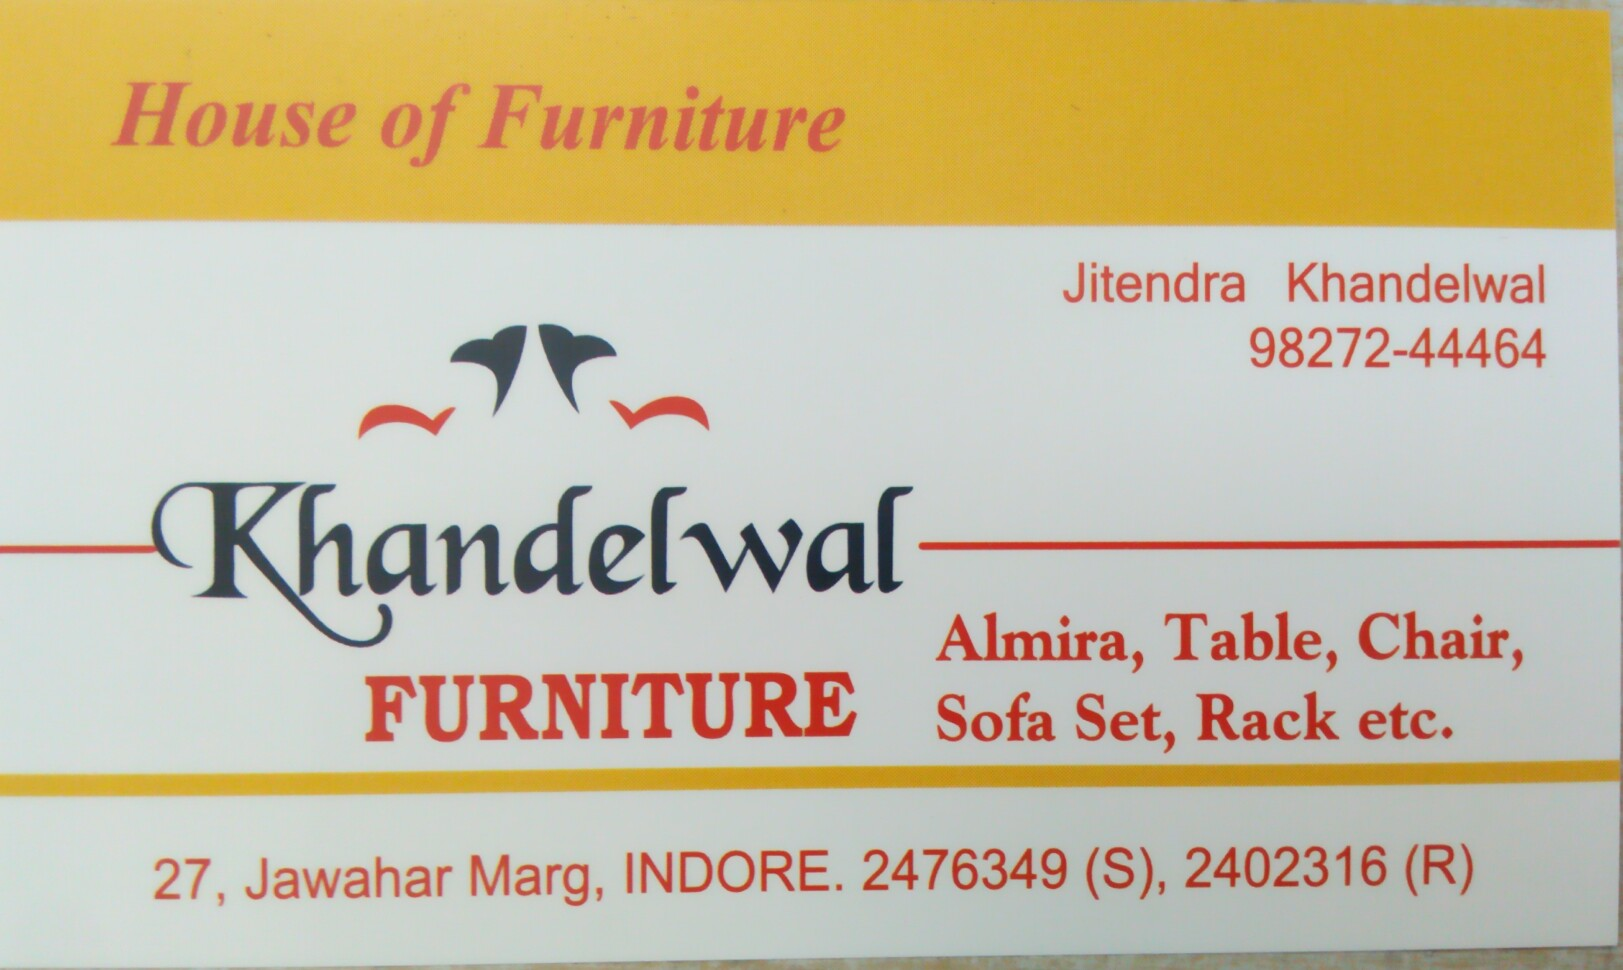 Khandelwal furniture